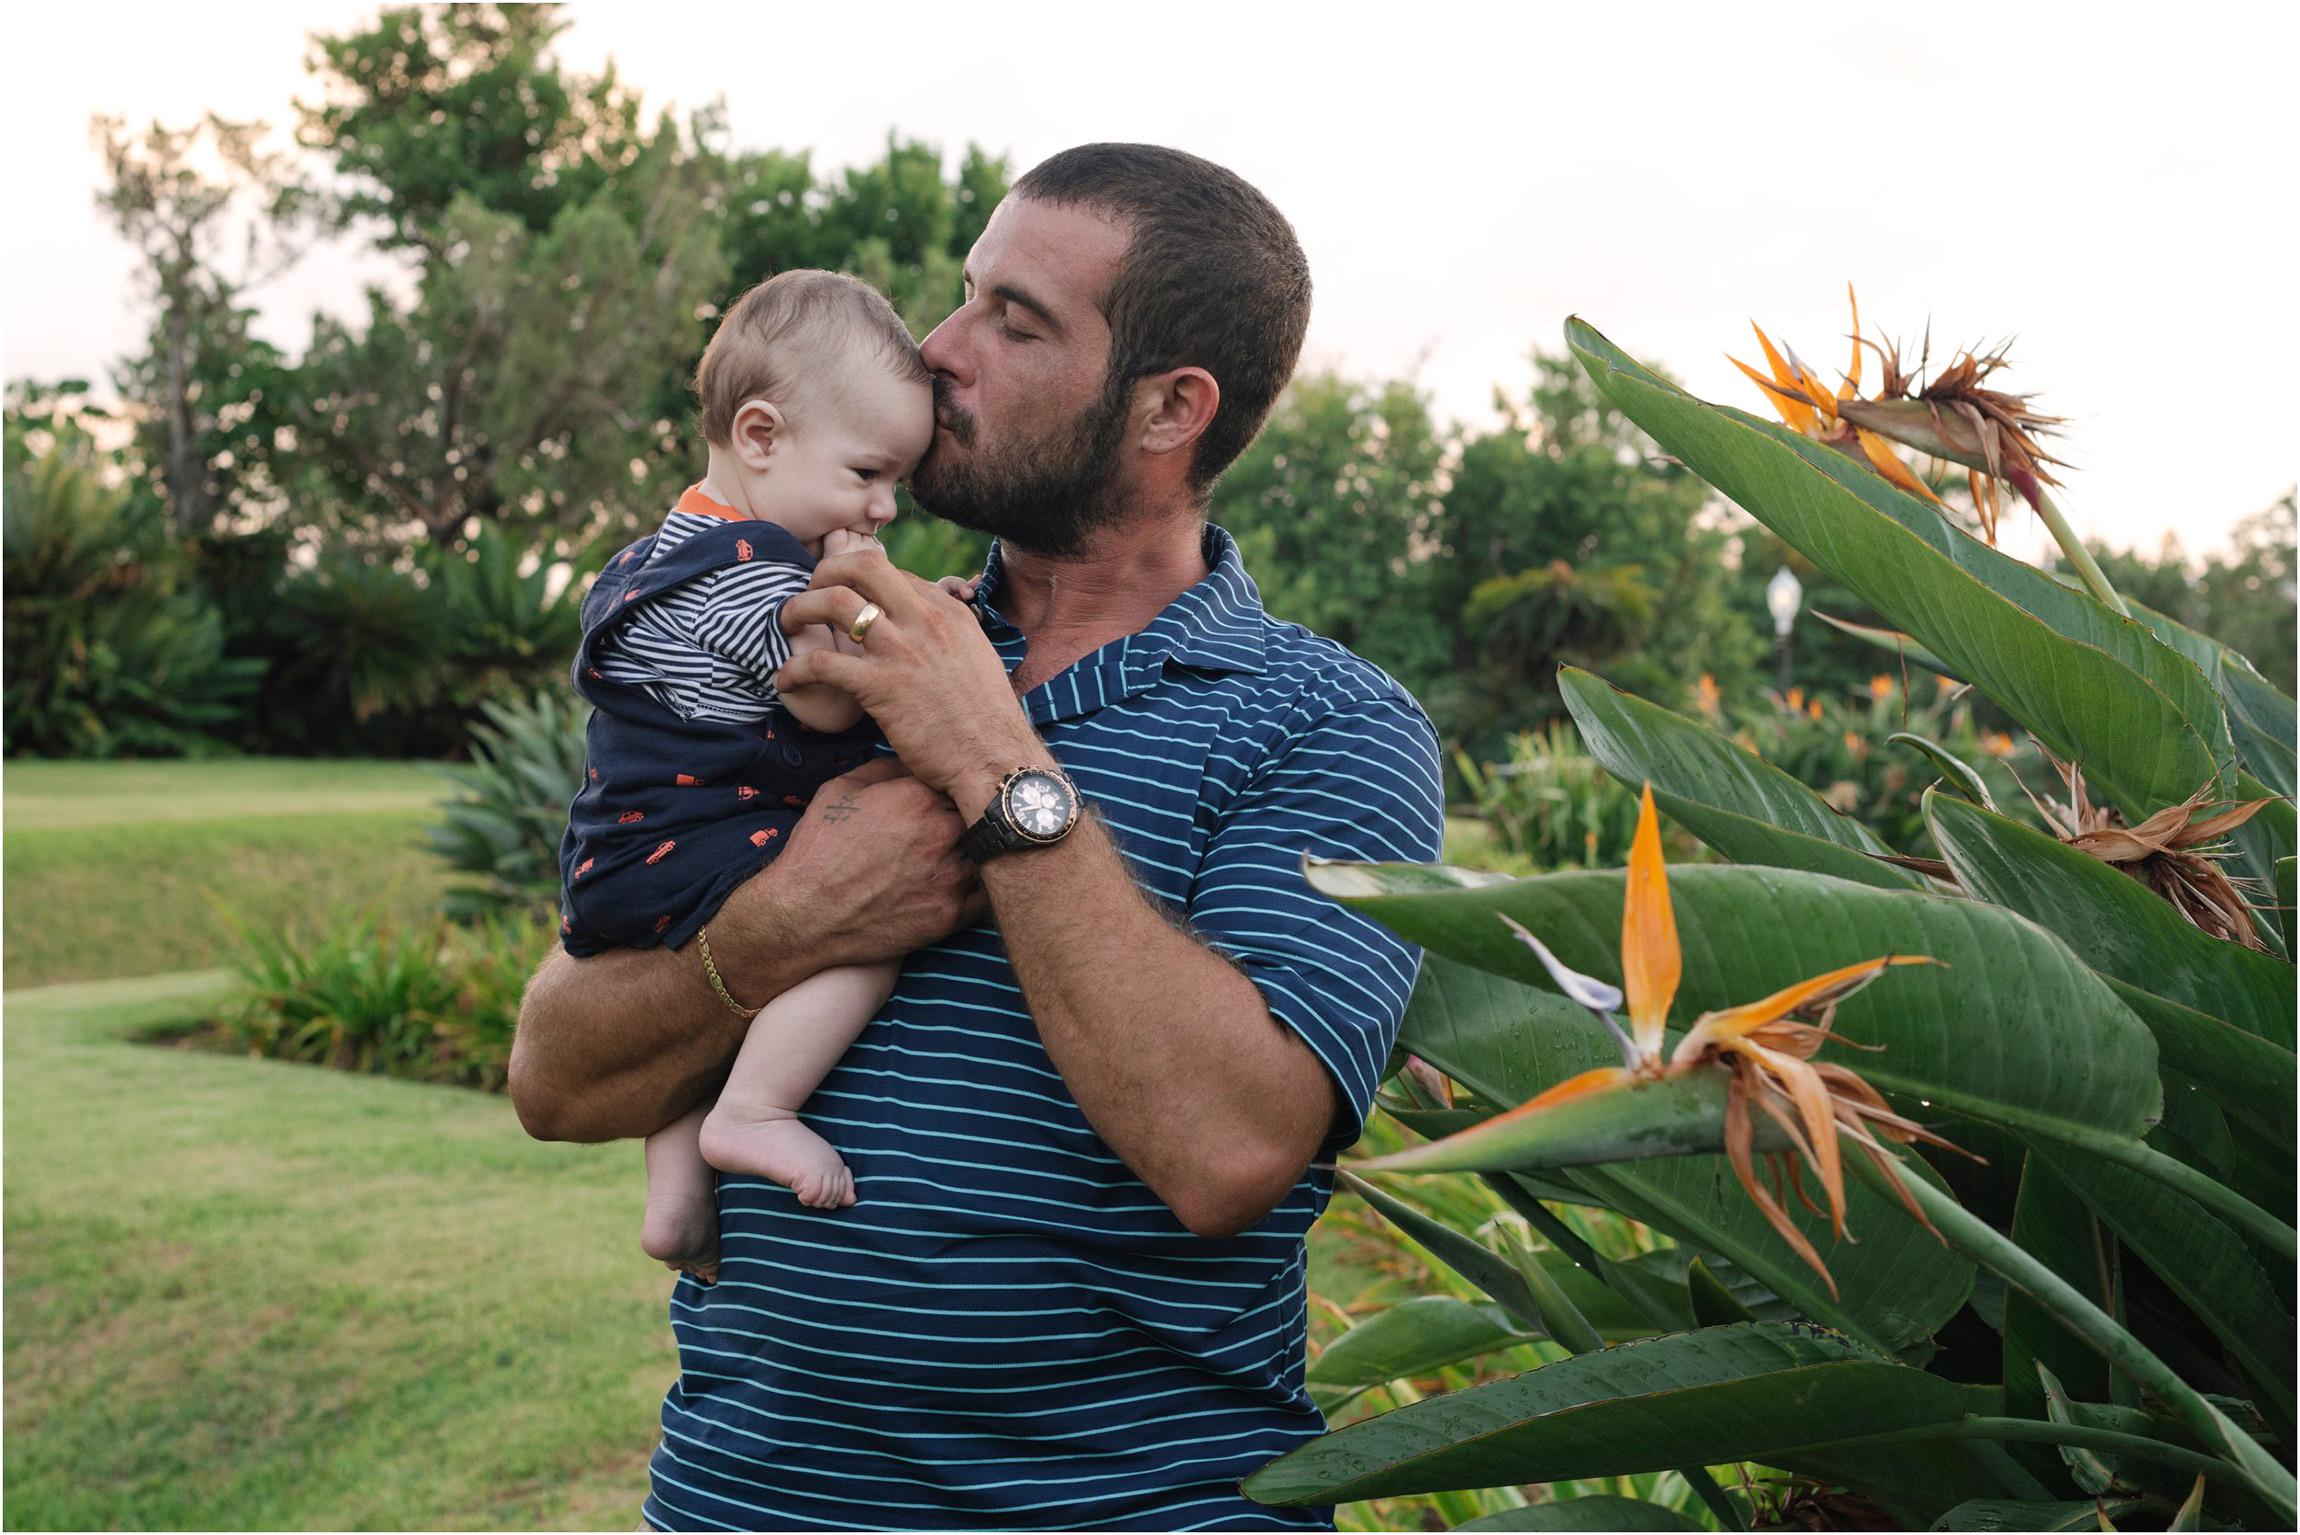 ©FianderFoto_Bermuda Family Photogarpher_Botanical Gardens_Amaro_015.jpg